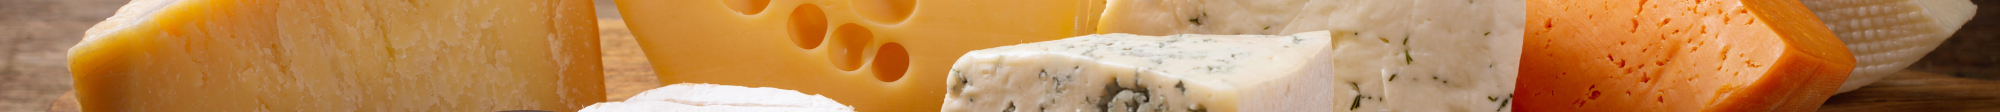 Comprar  quesos Alemania gourmet online   Mixtura Gourmet